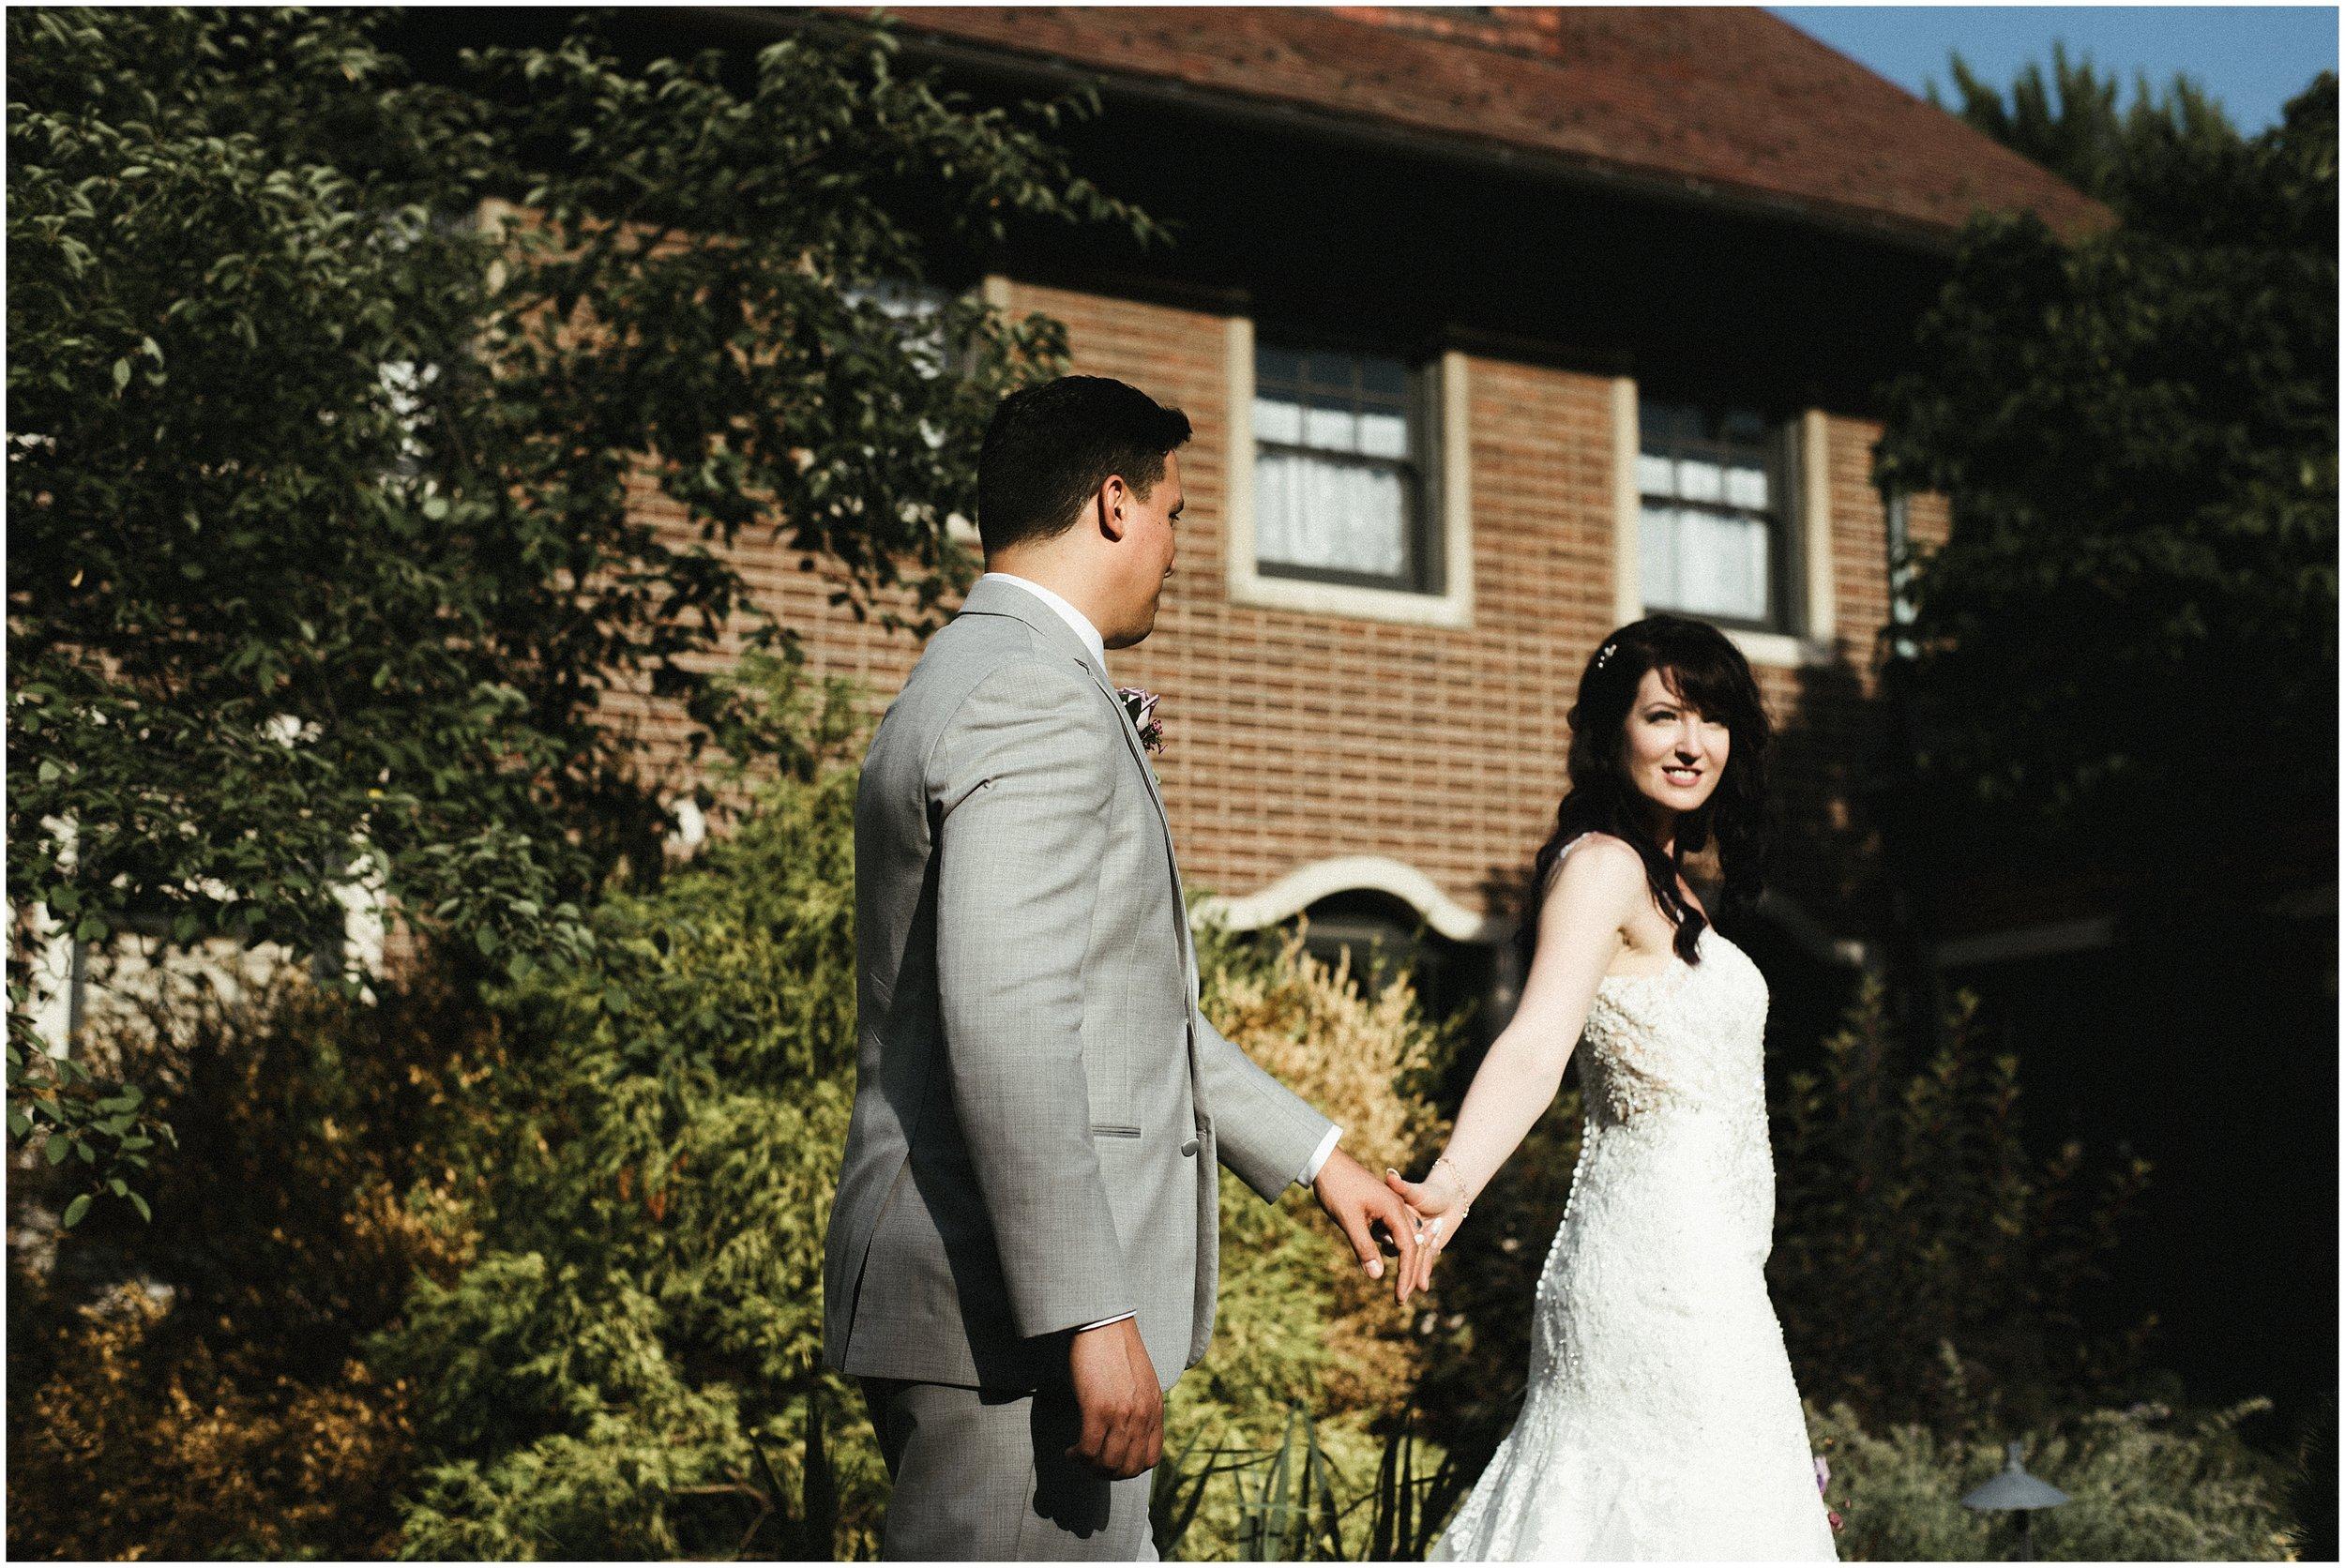 Sarah and Marcel   Romantic Vintage Wedding at Cheney Mansion   Oak Park, IL